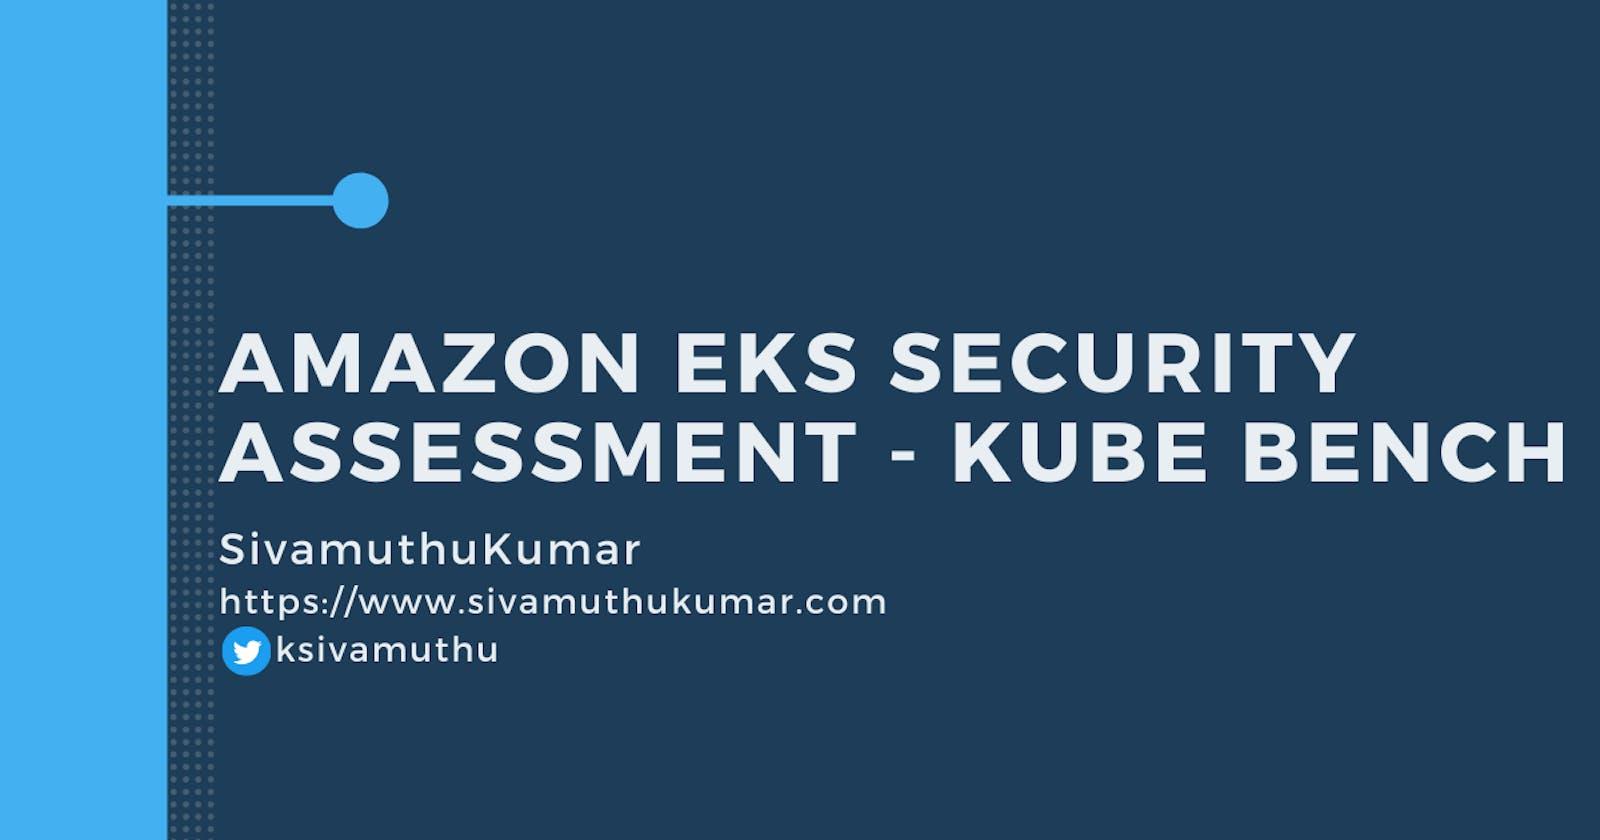 Amazon EKS Security Assessment - Kube Bench